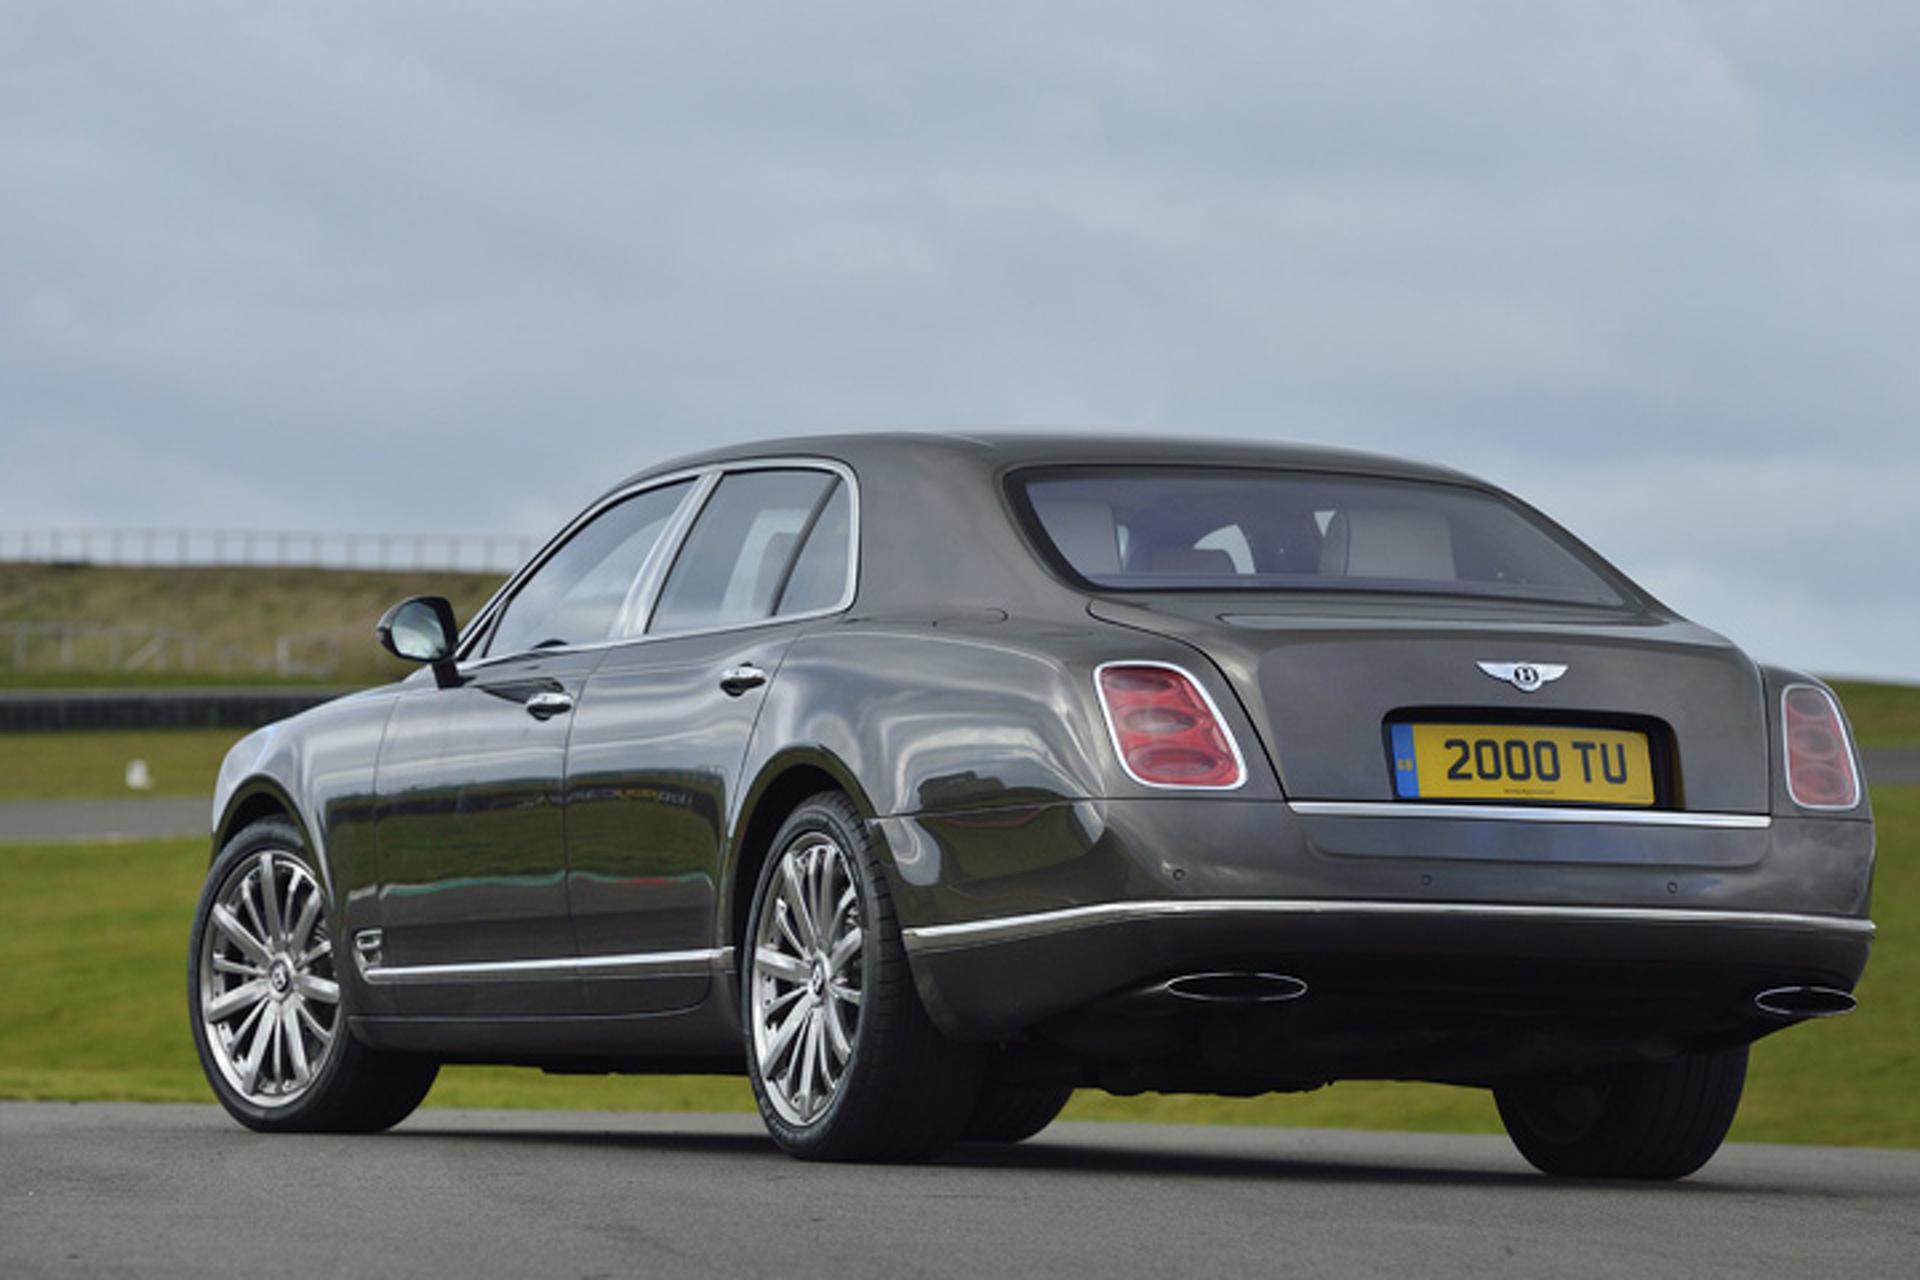 Bentley Mulsanne Speed Gets the Green Light